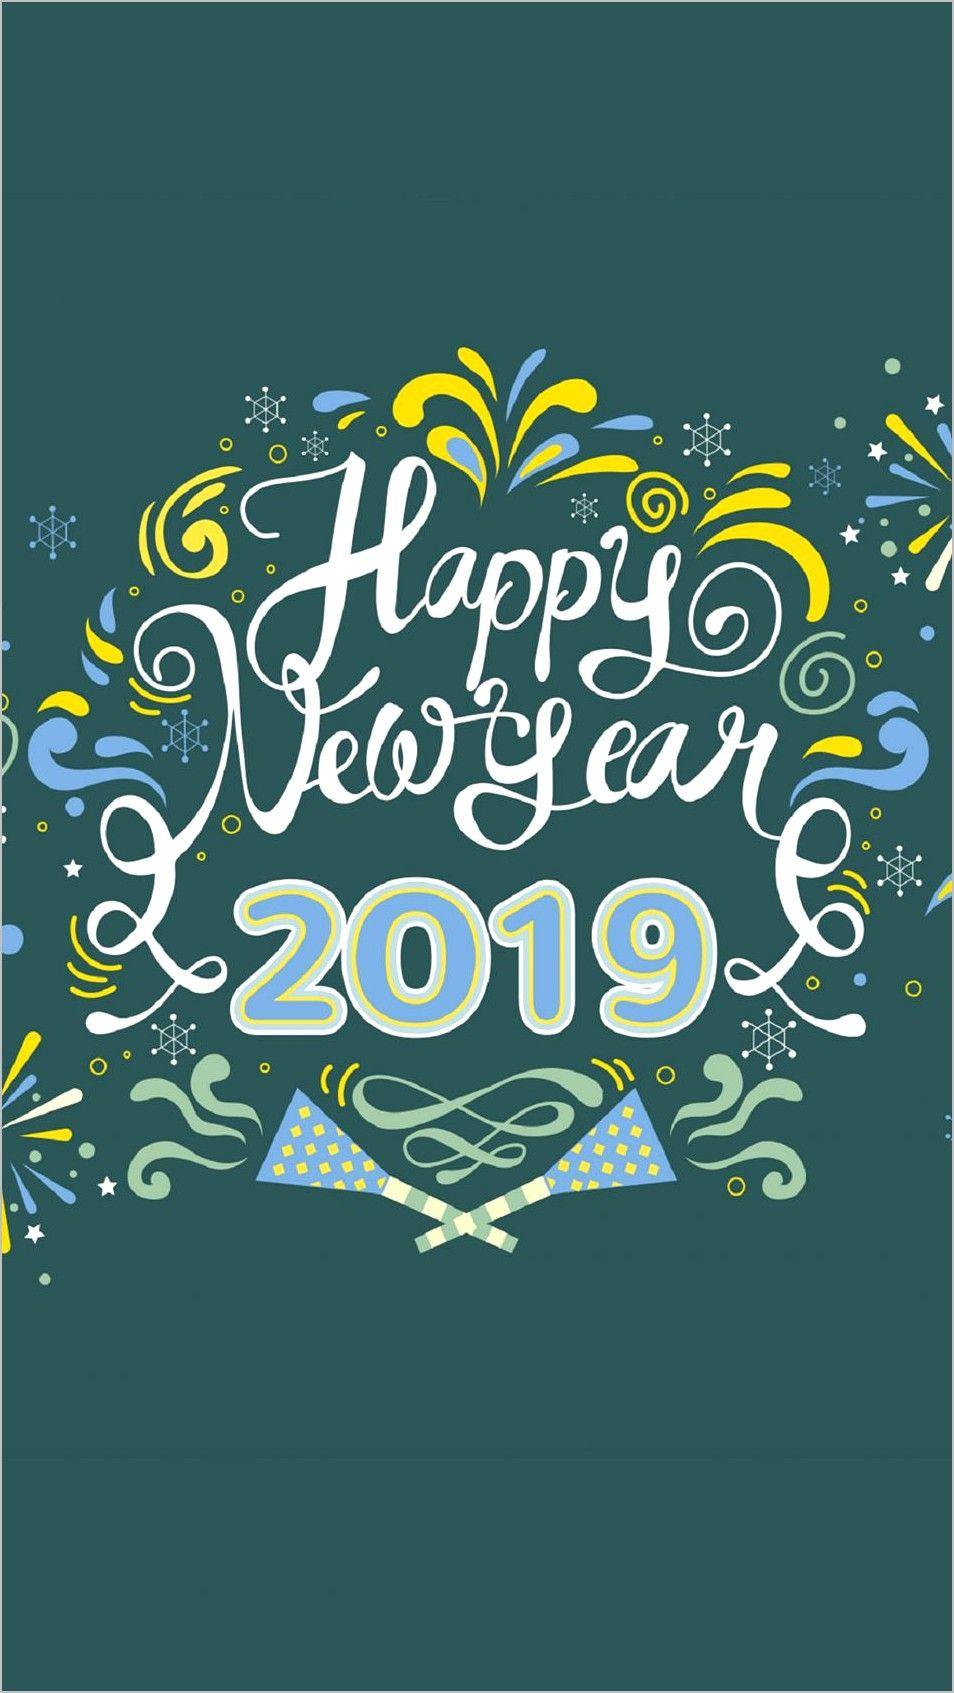 New Mobile Wallpaper 4k Happy New Year 2019 Mobile Wallpaper Wallpaper